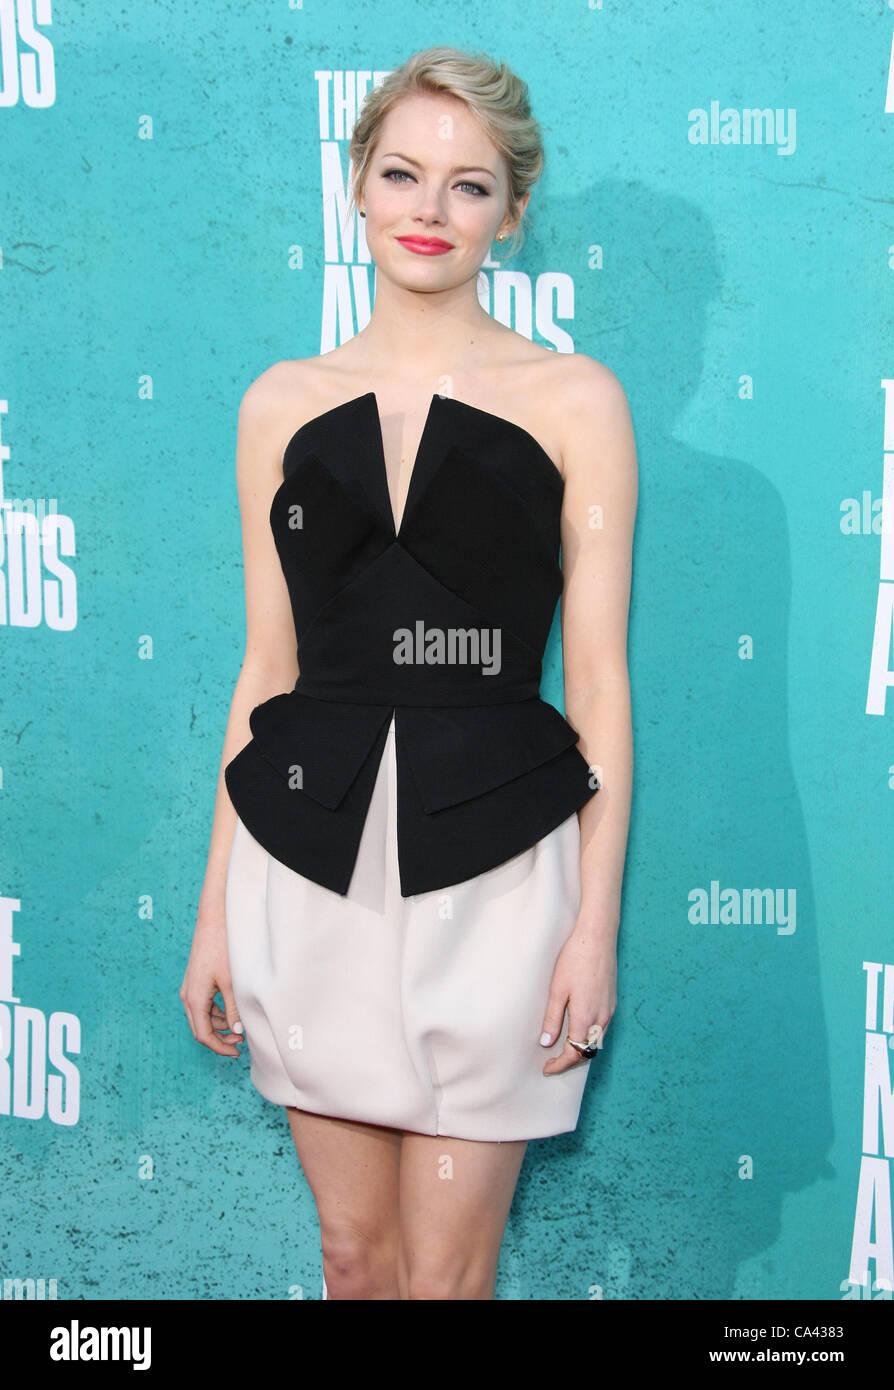 EMMA STONE THE MTV MOVIE AWARDS 2012. ARRIVALS LOS ANGELES CALIFORNIA USA 03 June 2012 - Stock Image